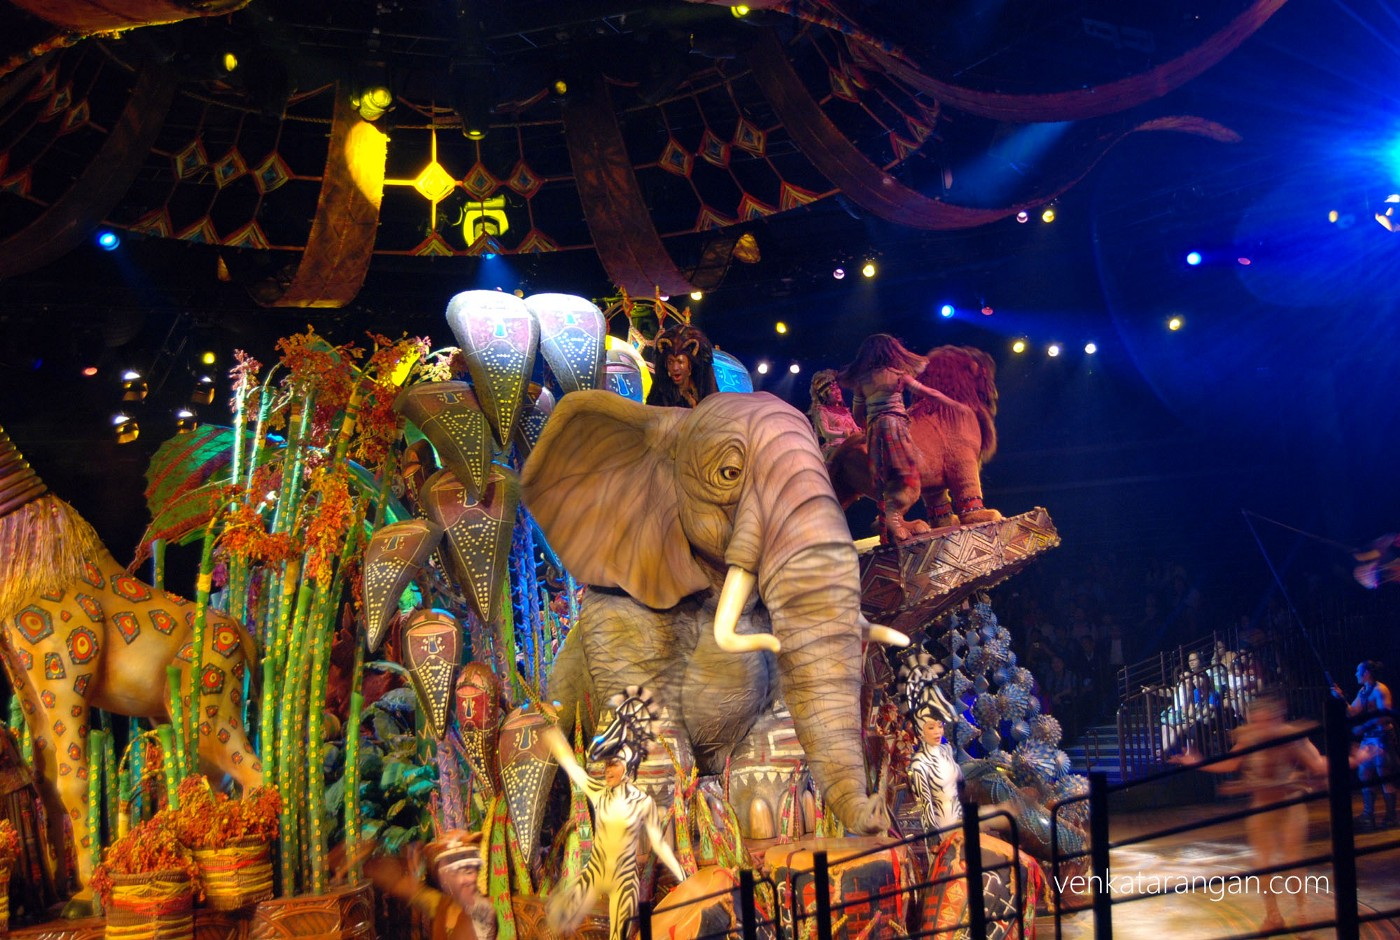 Simba - The Lion King show